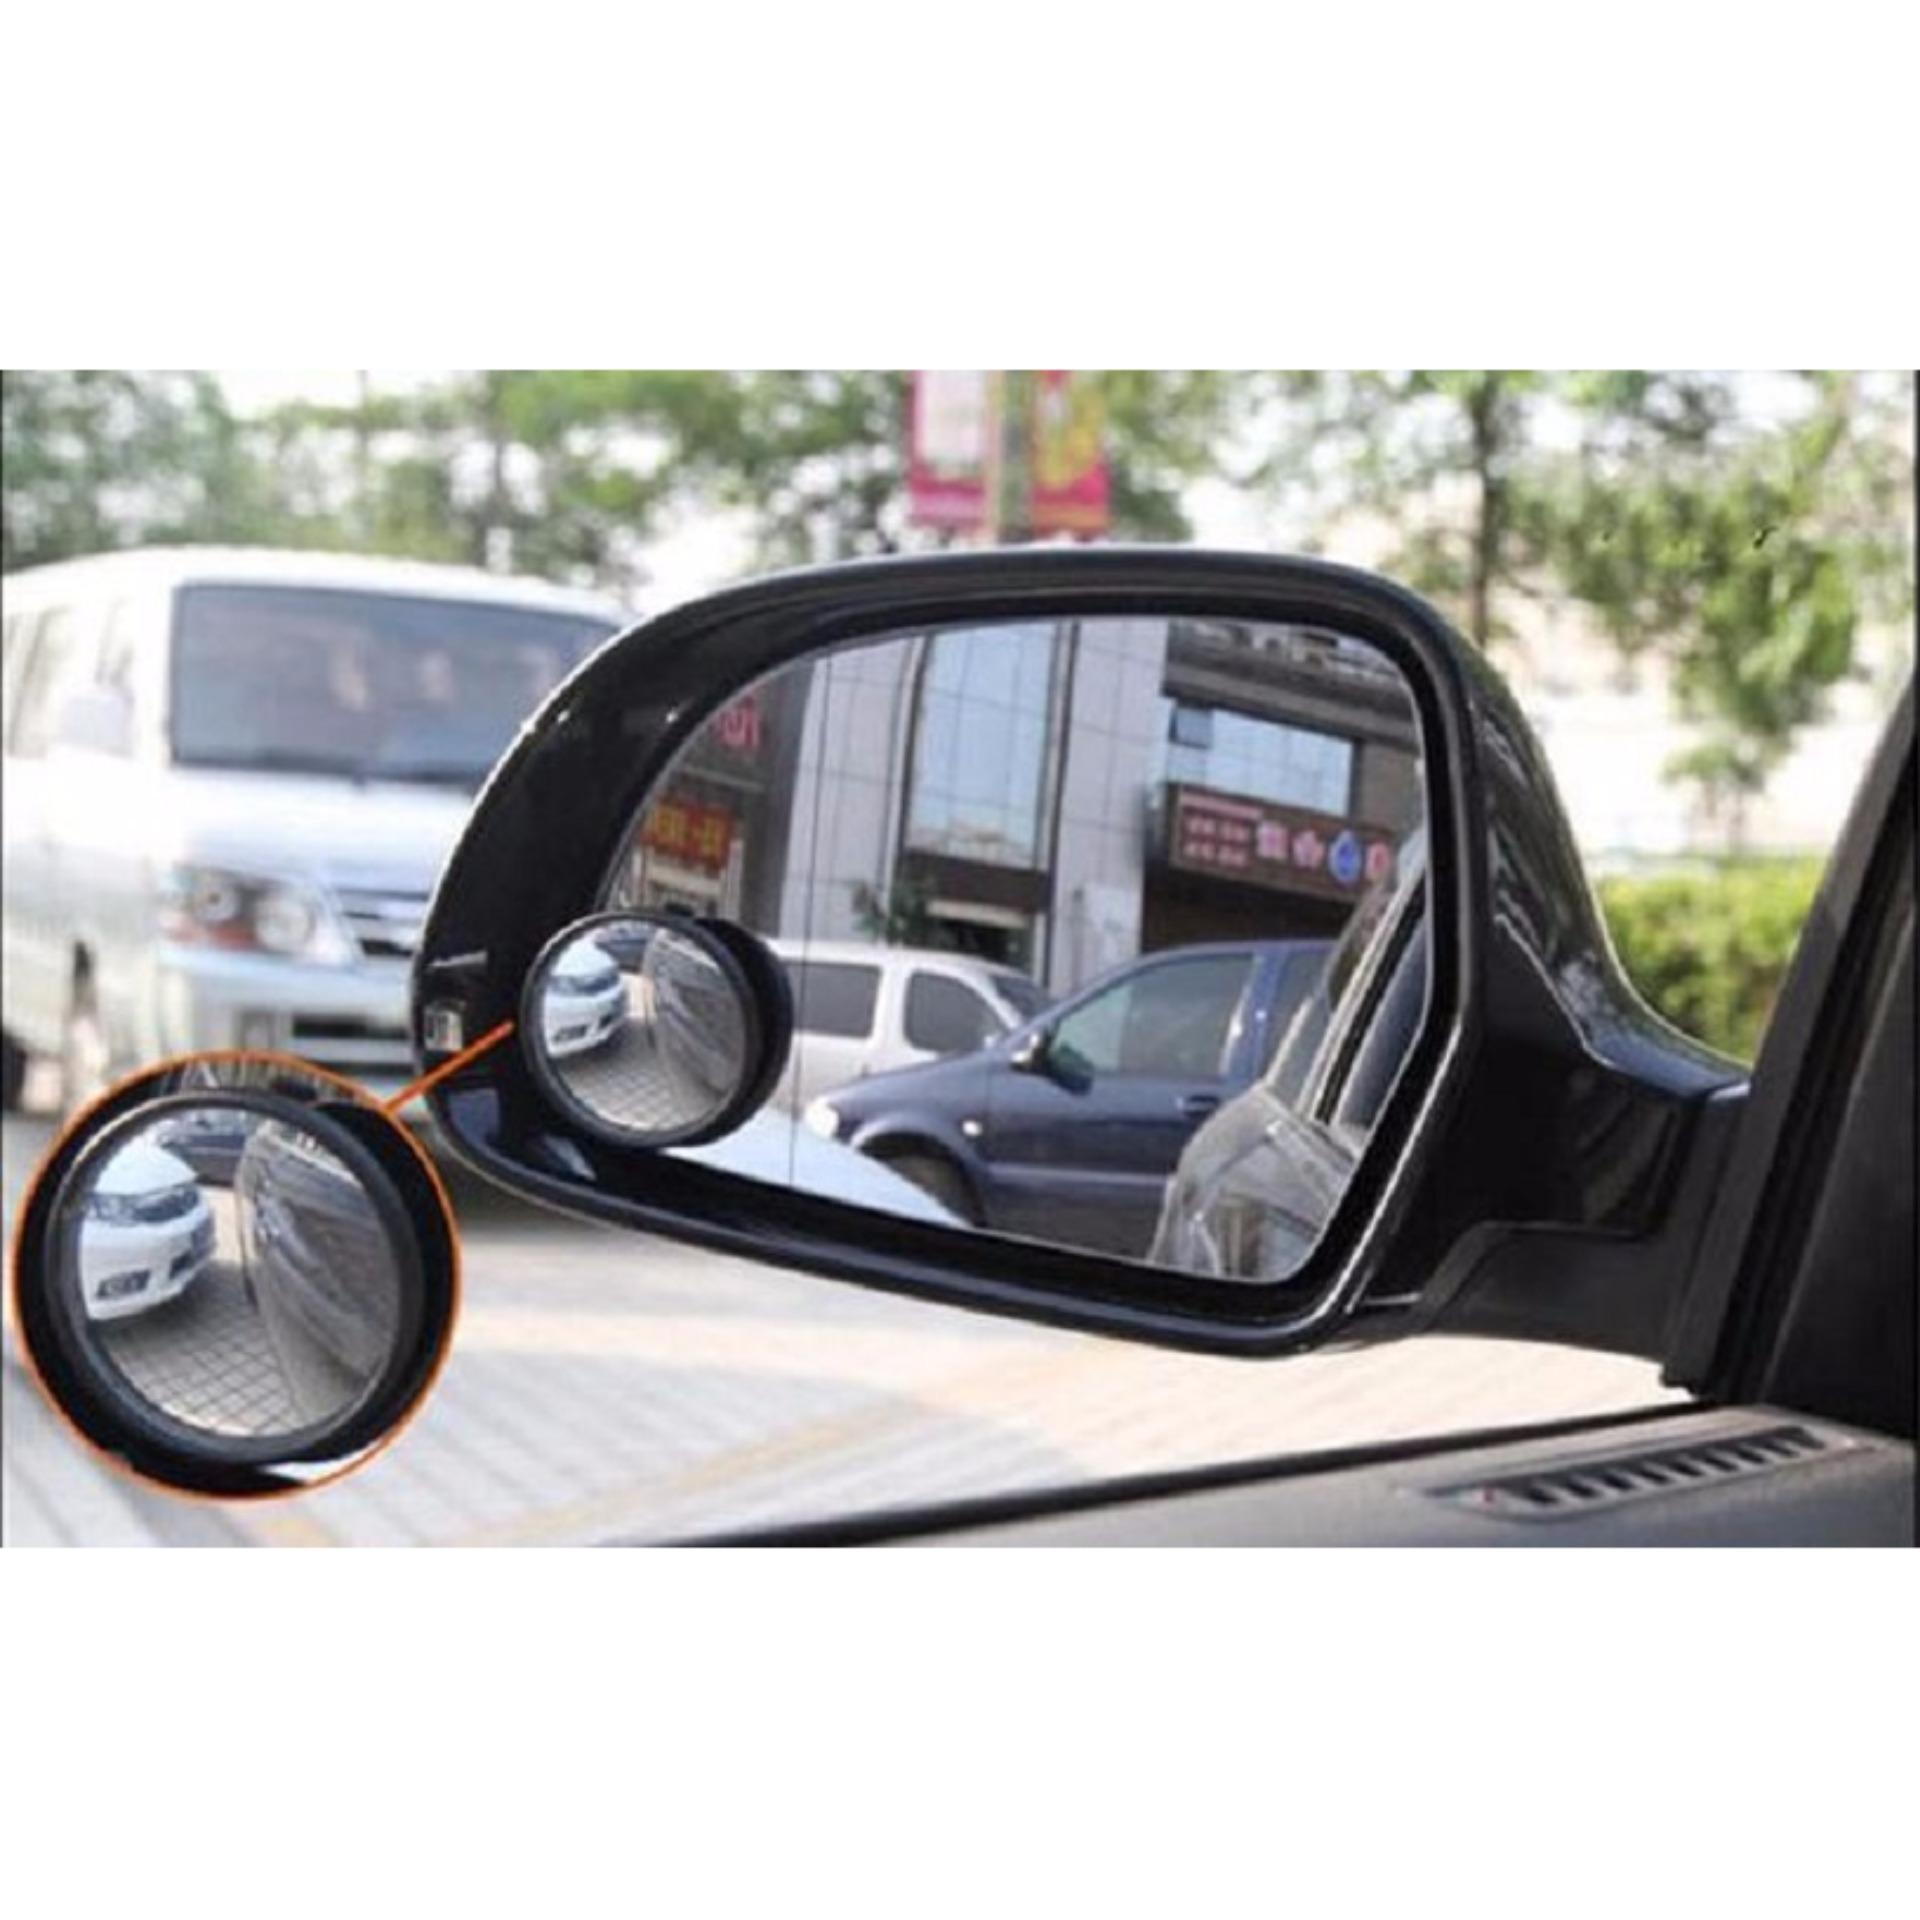 KACA SPION PUTAR MINI Tambahan Blind Spot Mirror Mobil Motor